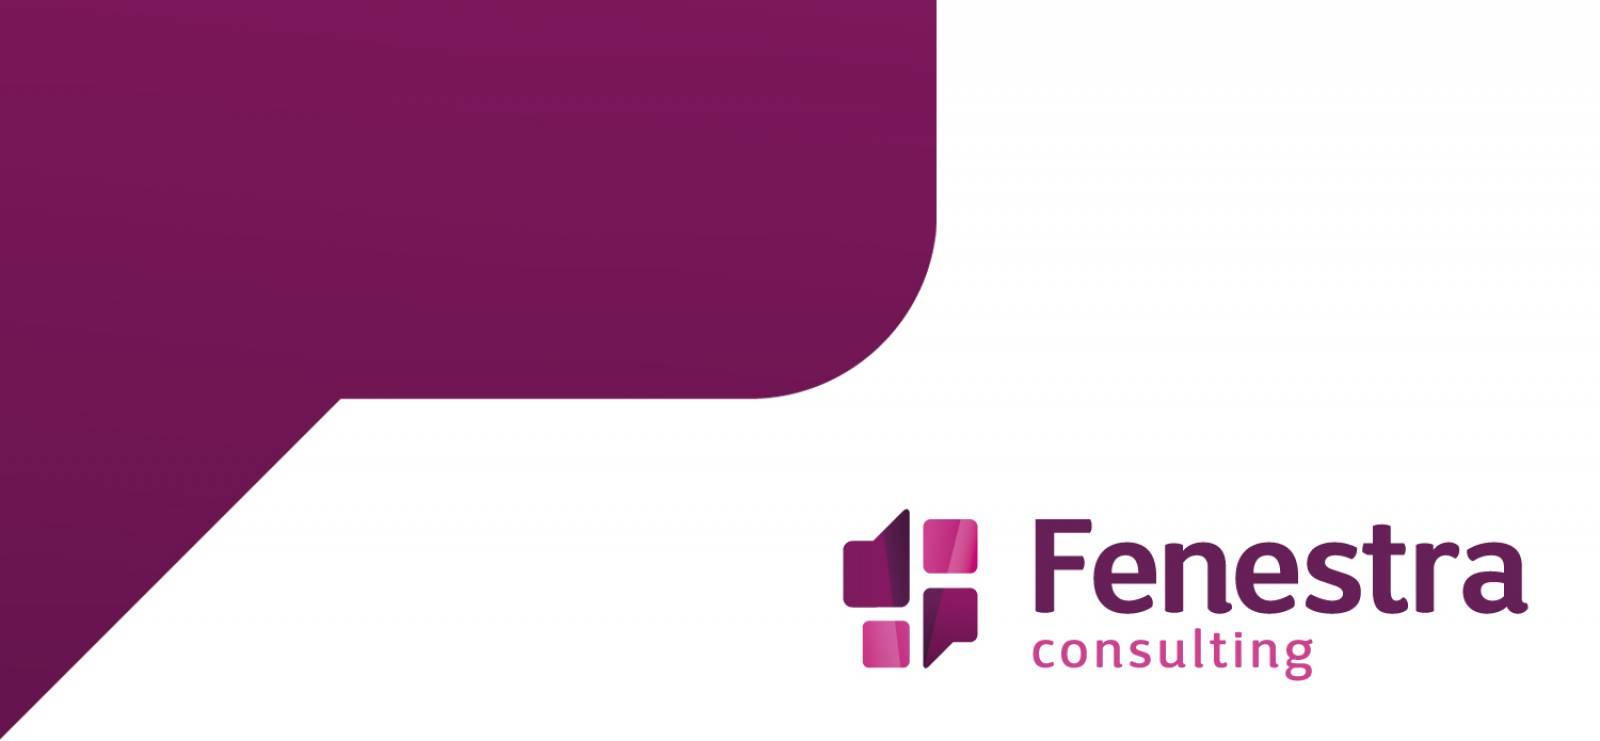 Fenestra-logo-2-design-agency-graphic-design-canterbury.jpg